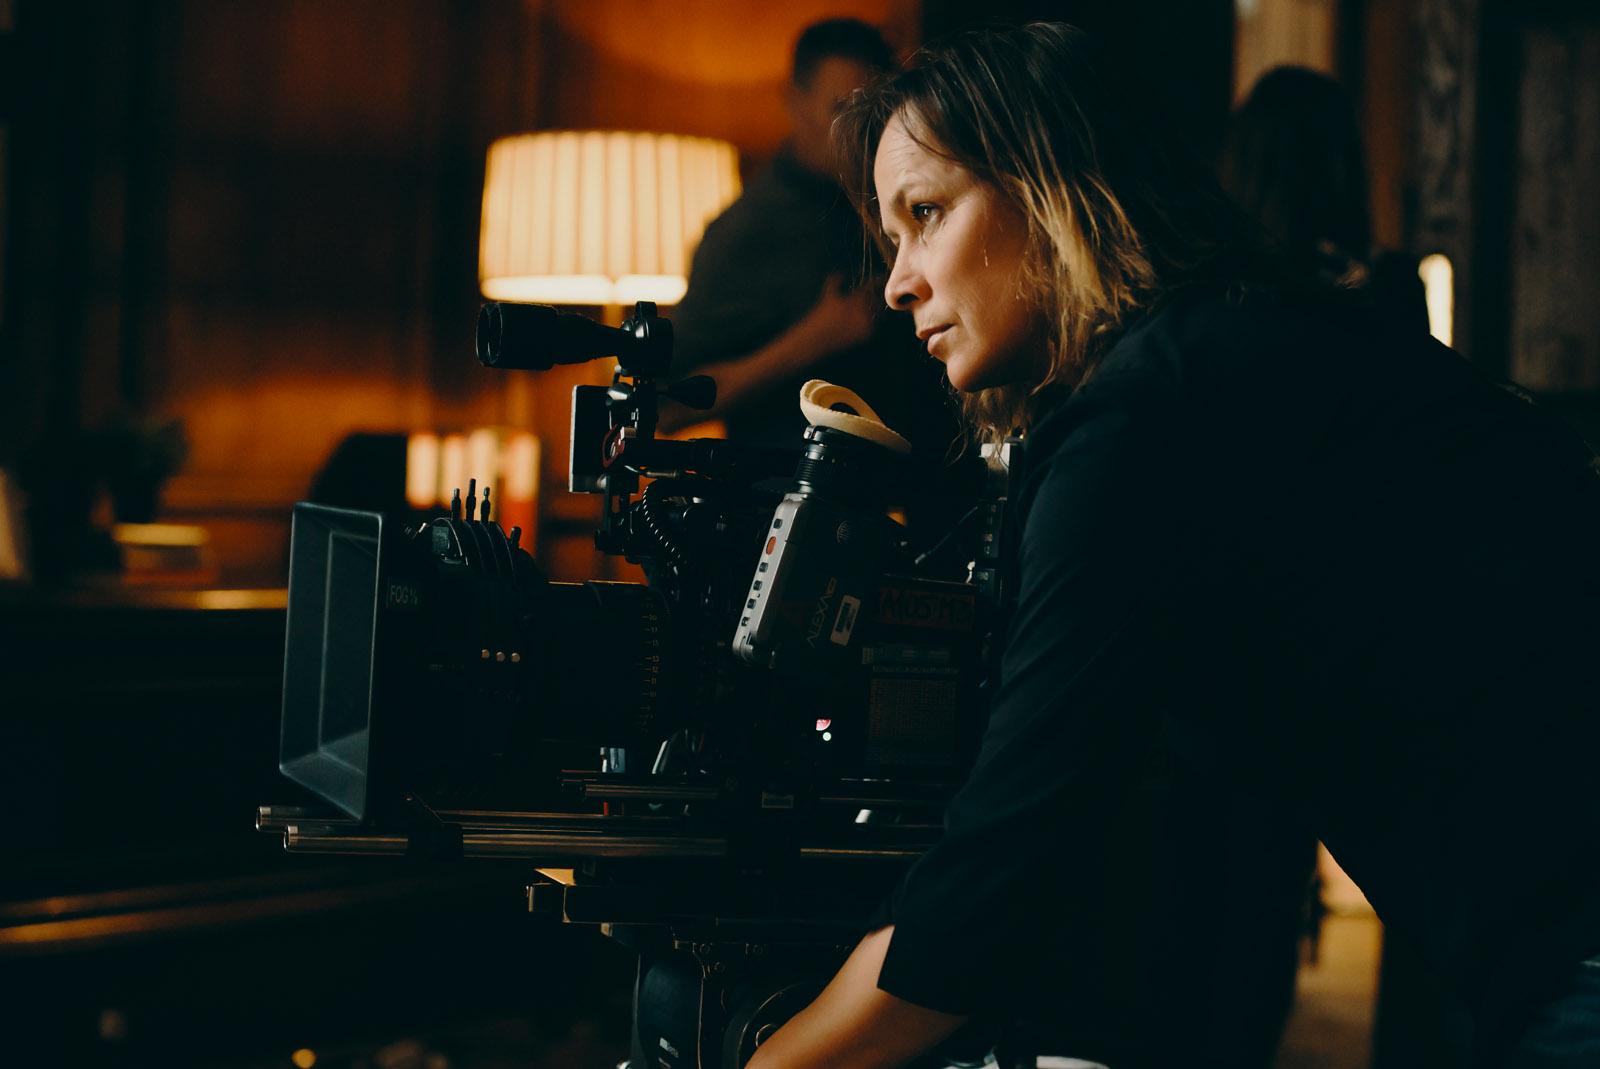 Cinematographer Oona Menges - Behind the scenes - London - photo credit Ashley Kingsbury